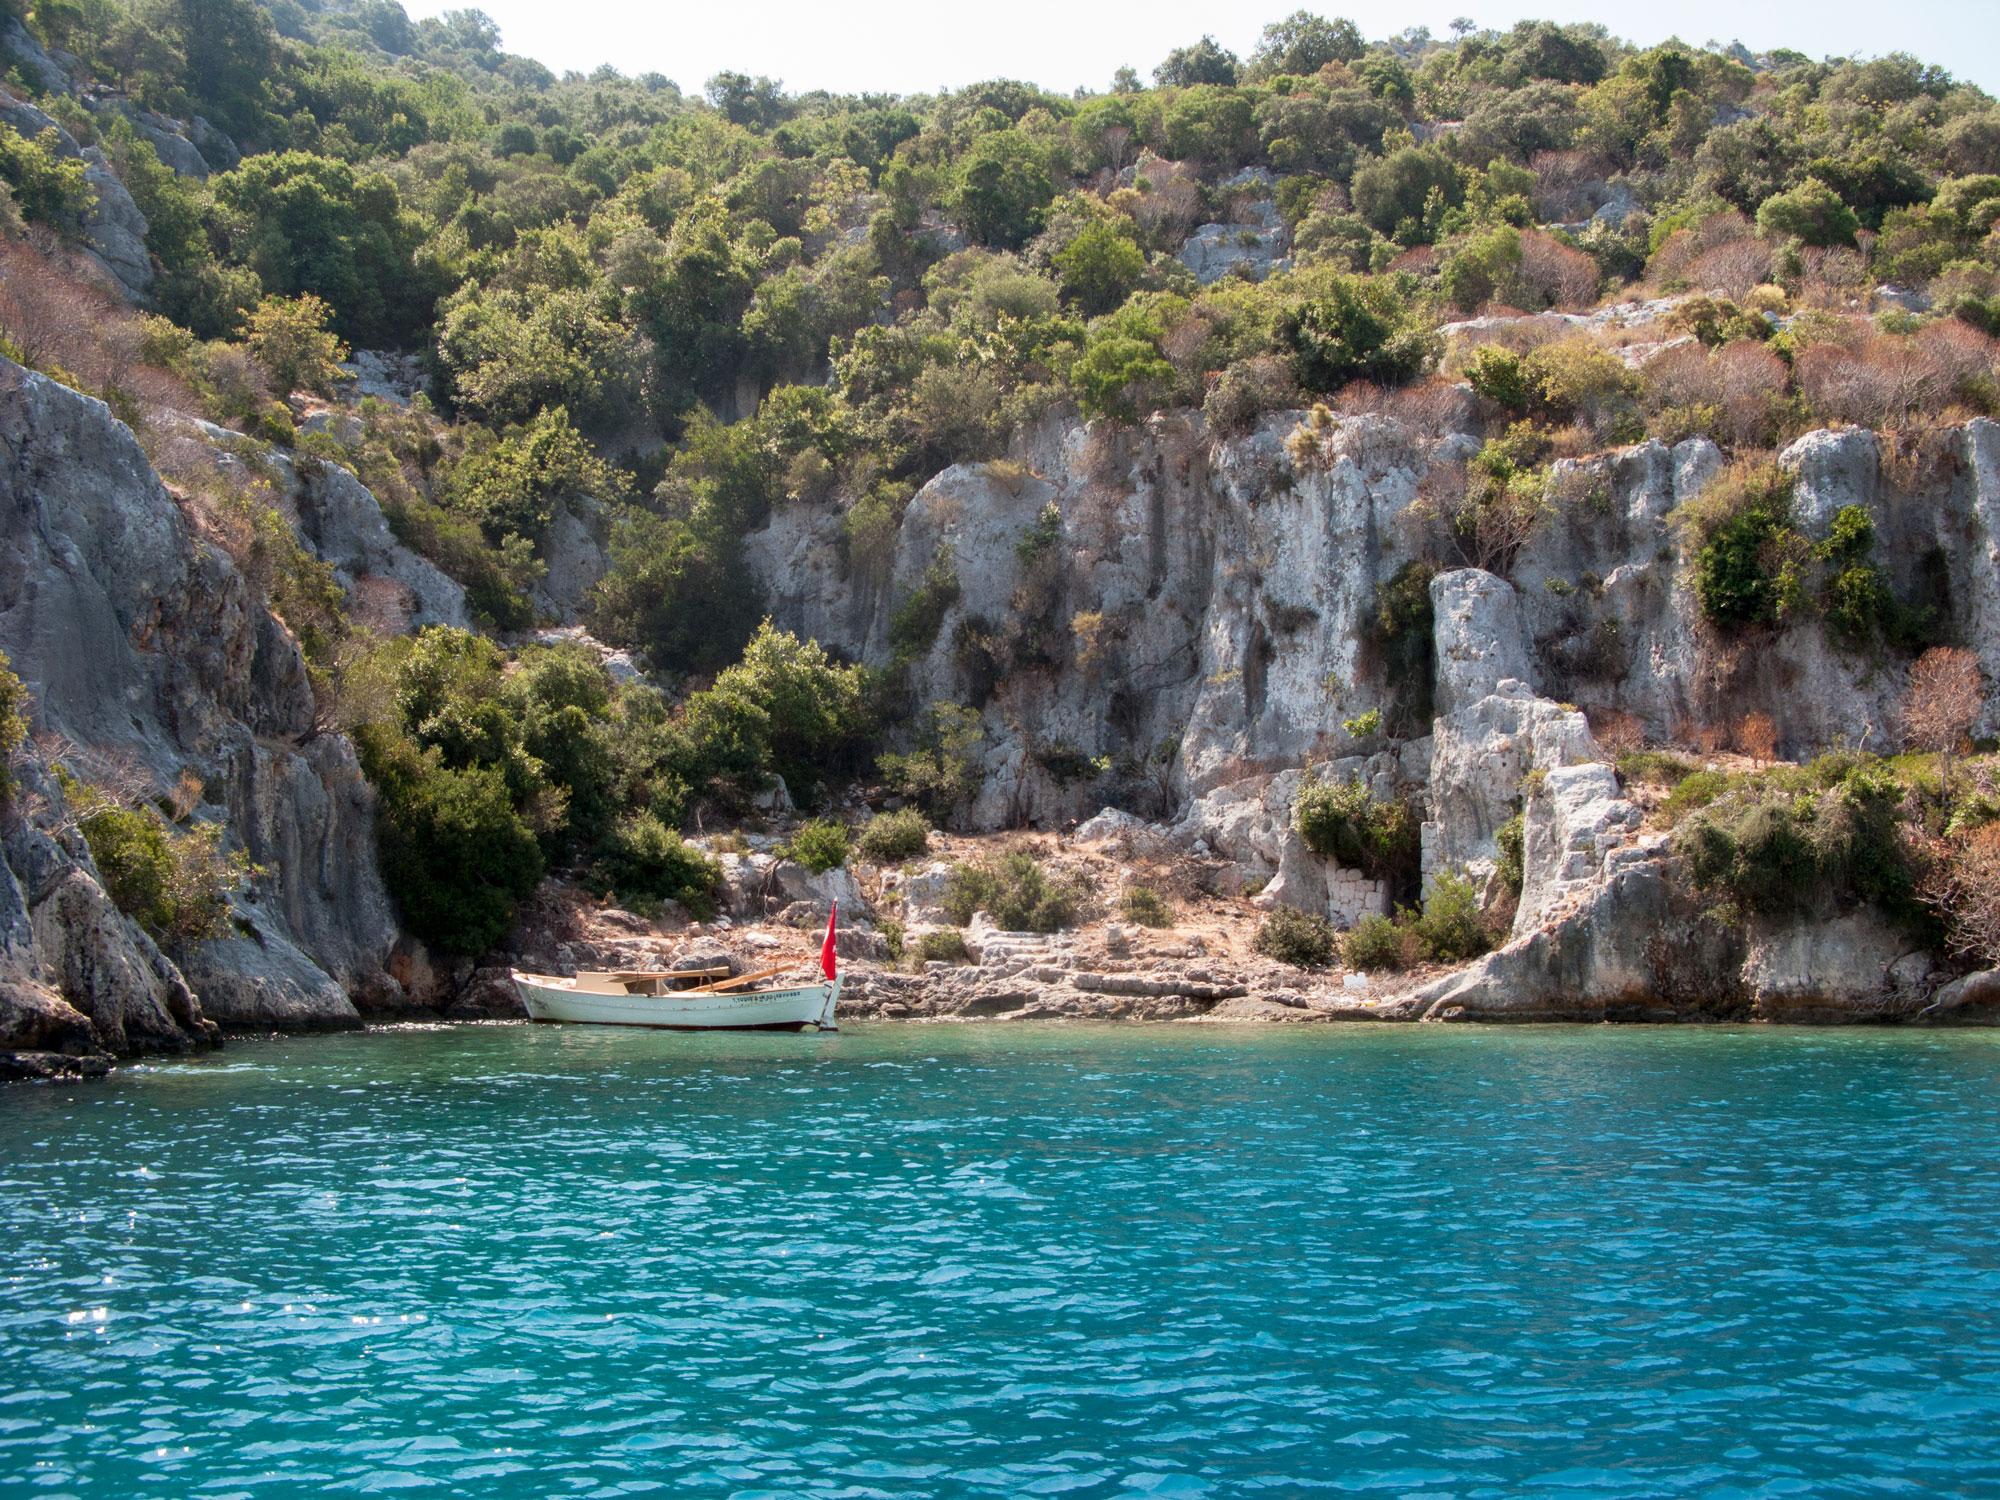 Turkey ucagiz kekova island boat